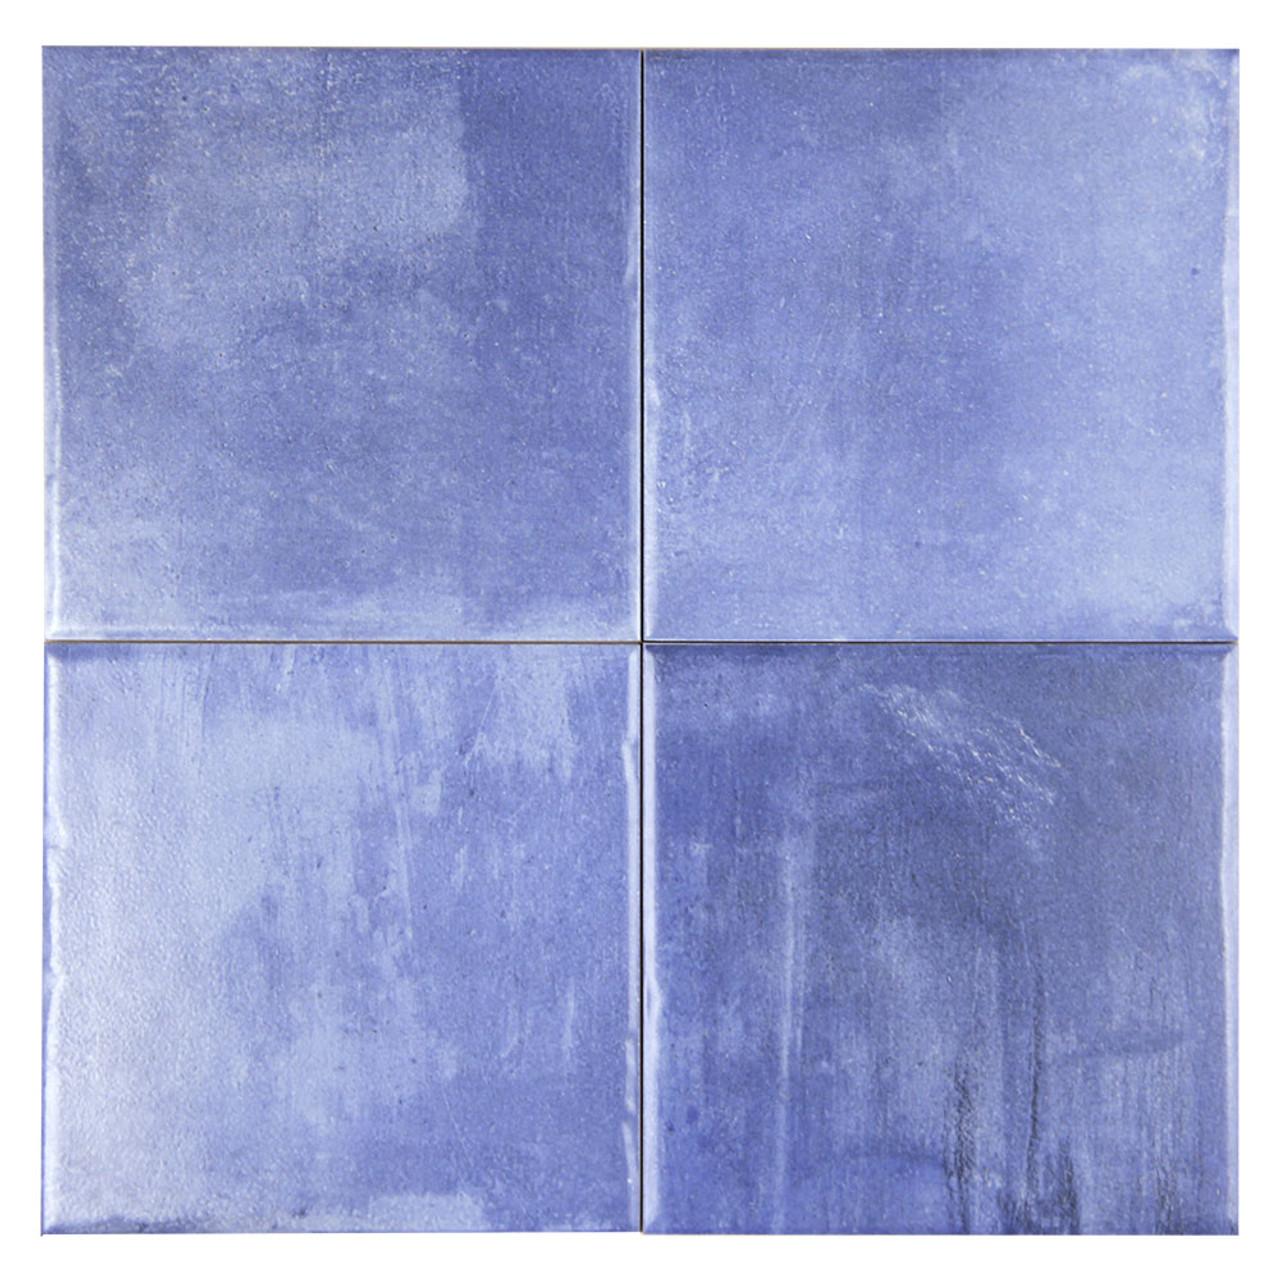 aqua pool azul blue 6x6 porcelain tile box of 10 sq ft